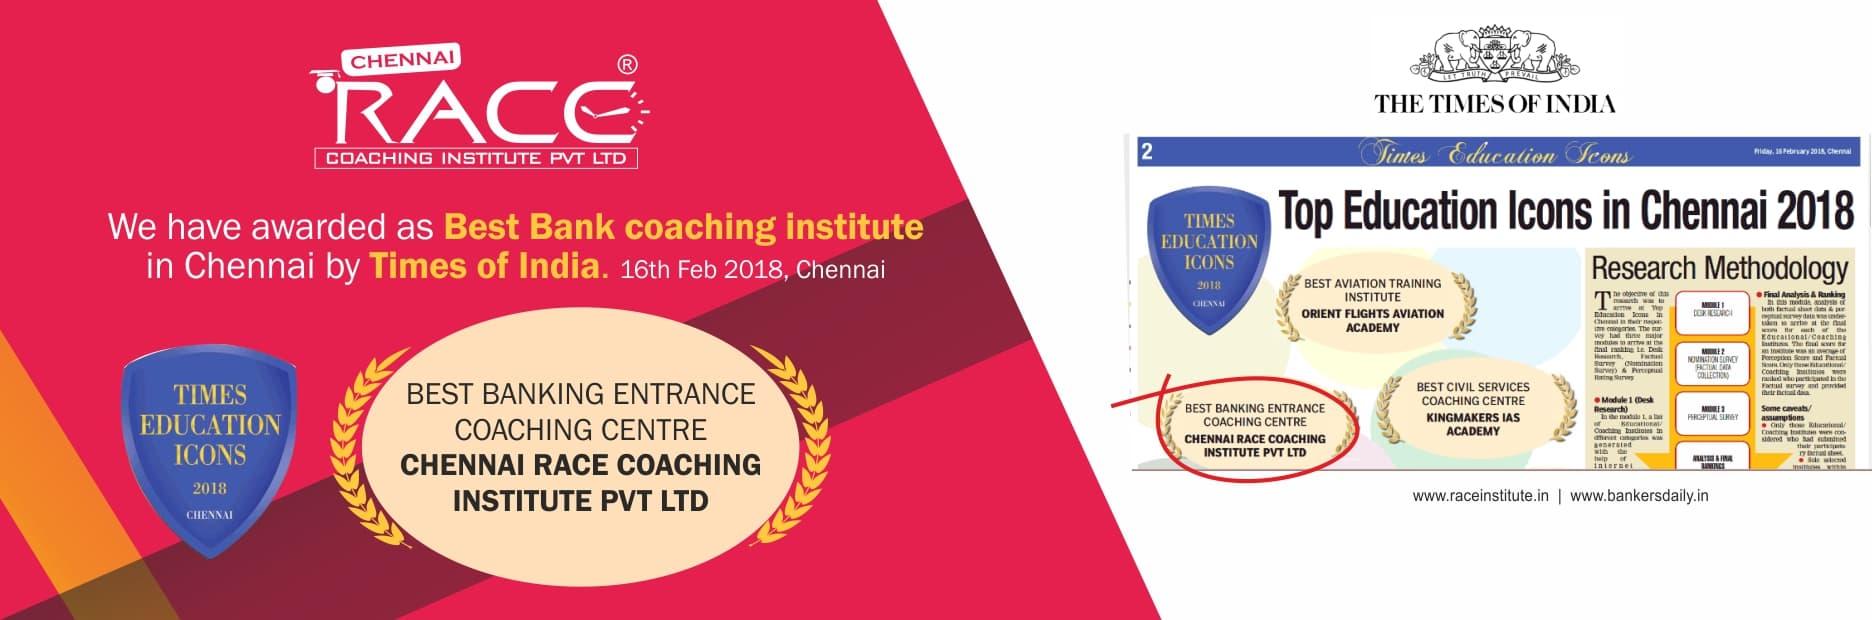 chennai race bank coaching institute awards